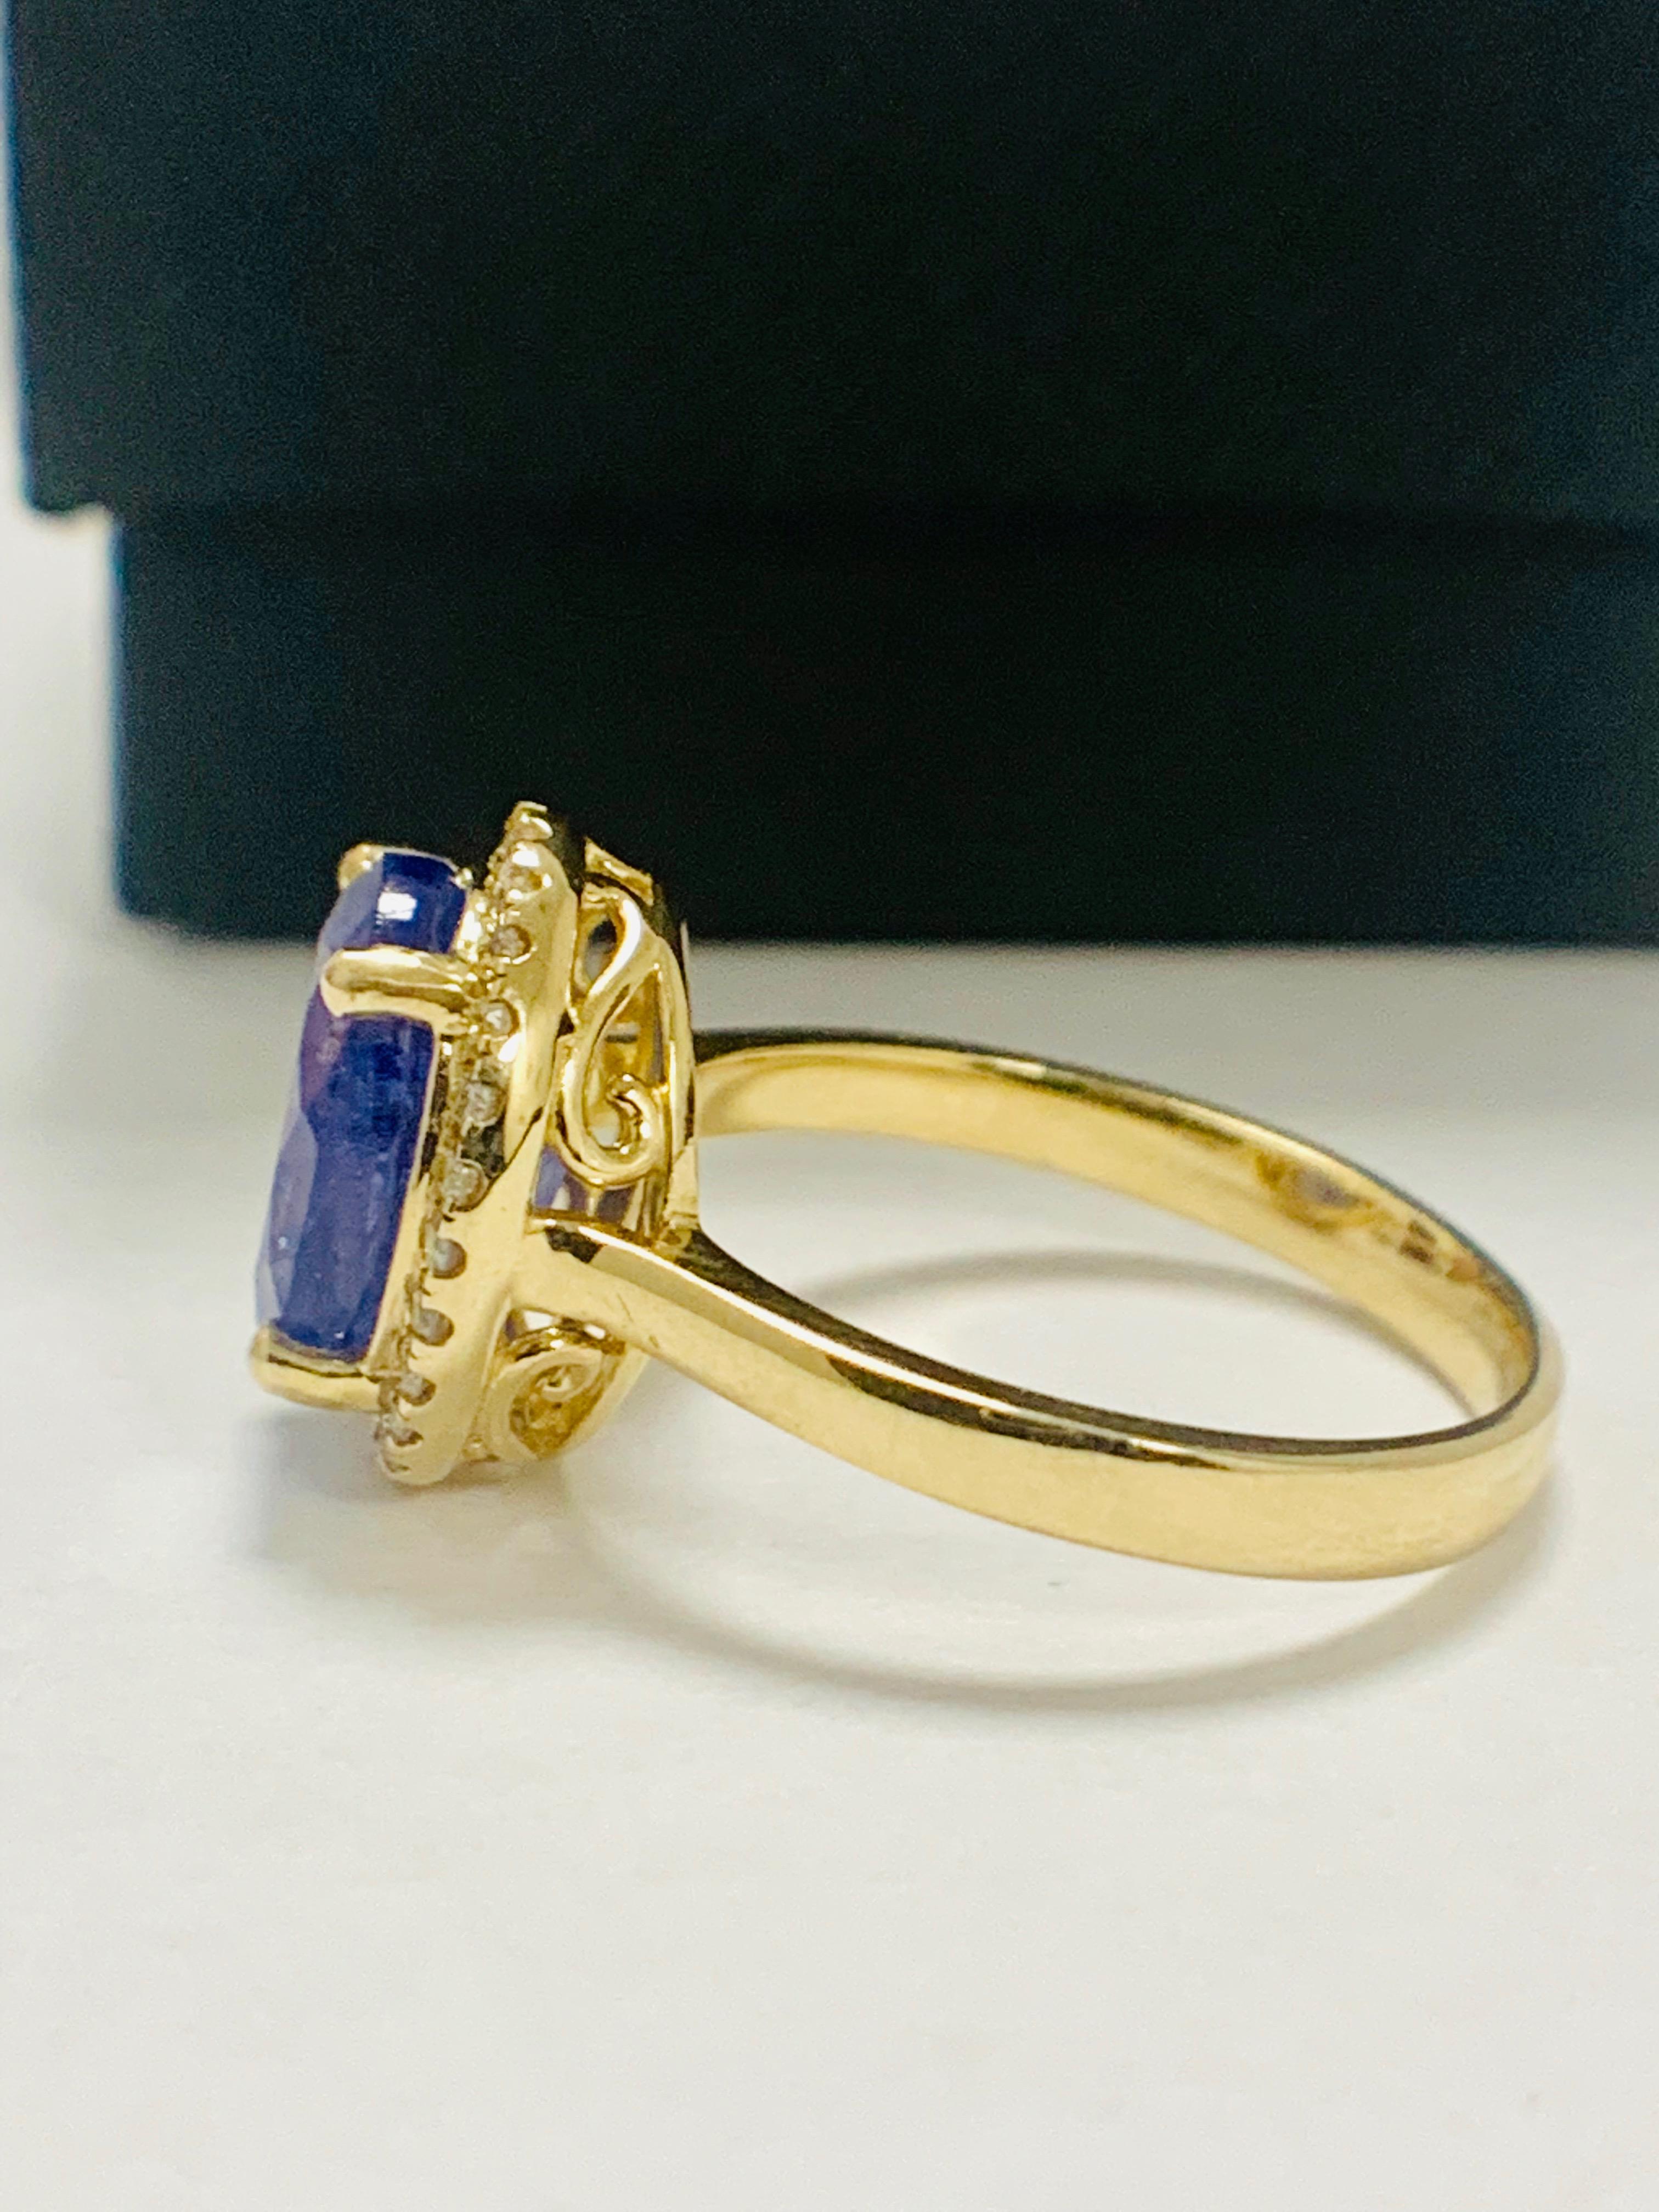 14ct Yellow Gold Tanzanite and Diamond ring - Image 4 of 13